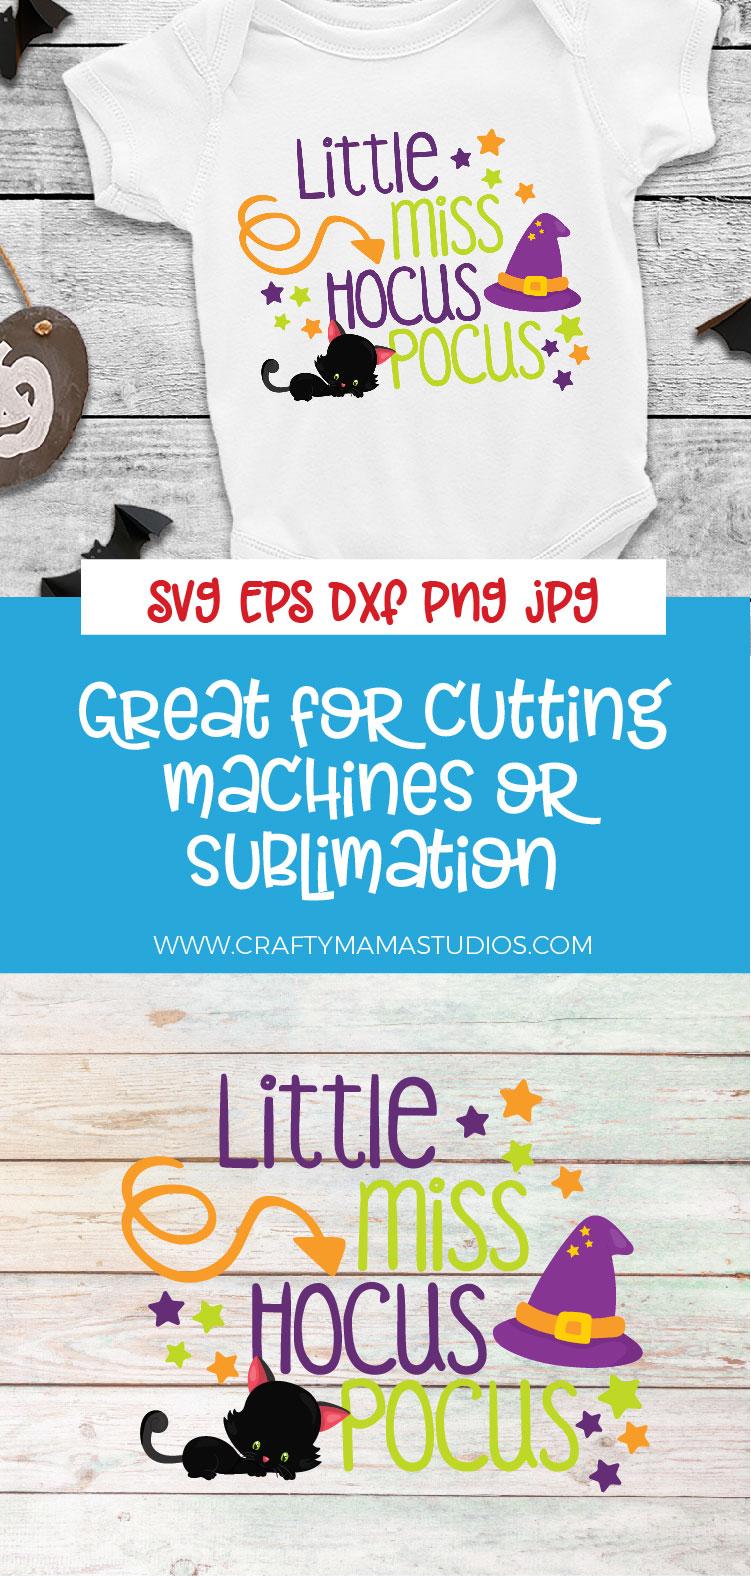 Little Miss Hocus Pocus SVG Sublimation, Halloween SVG example image 3